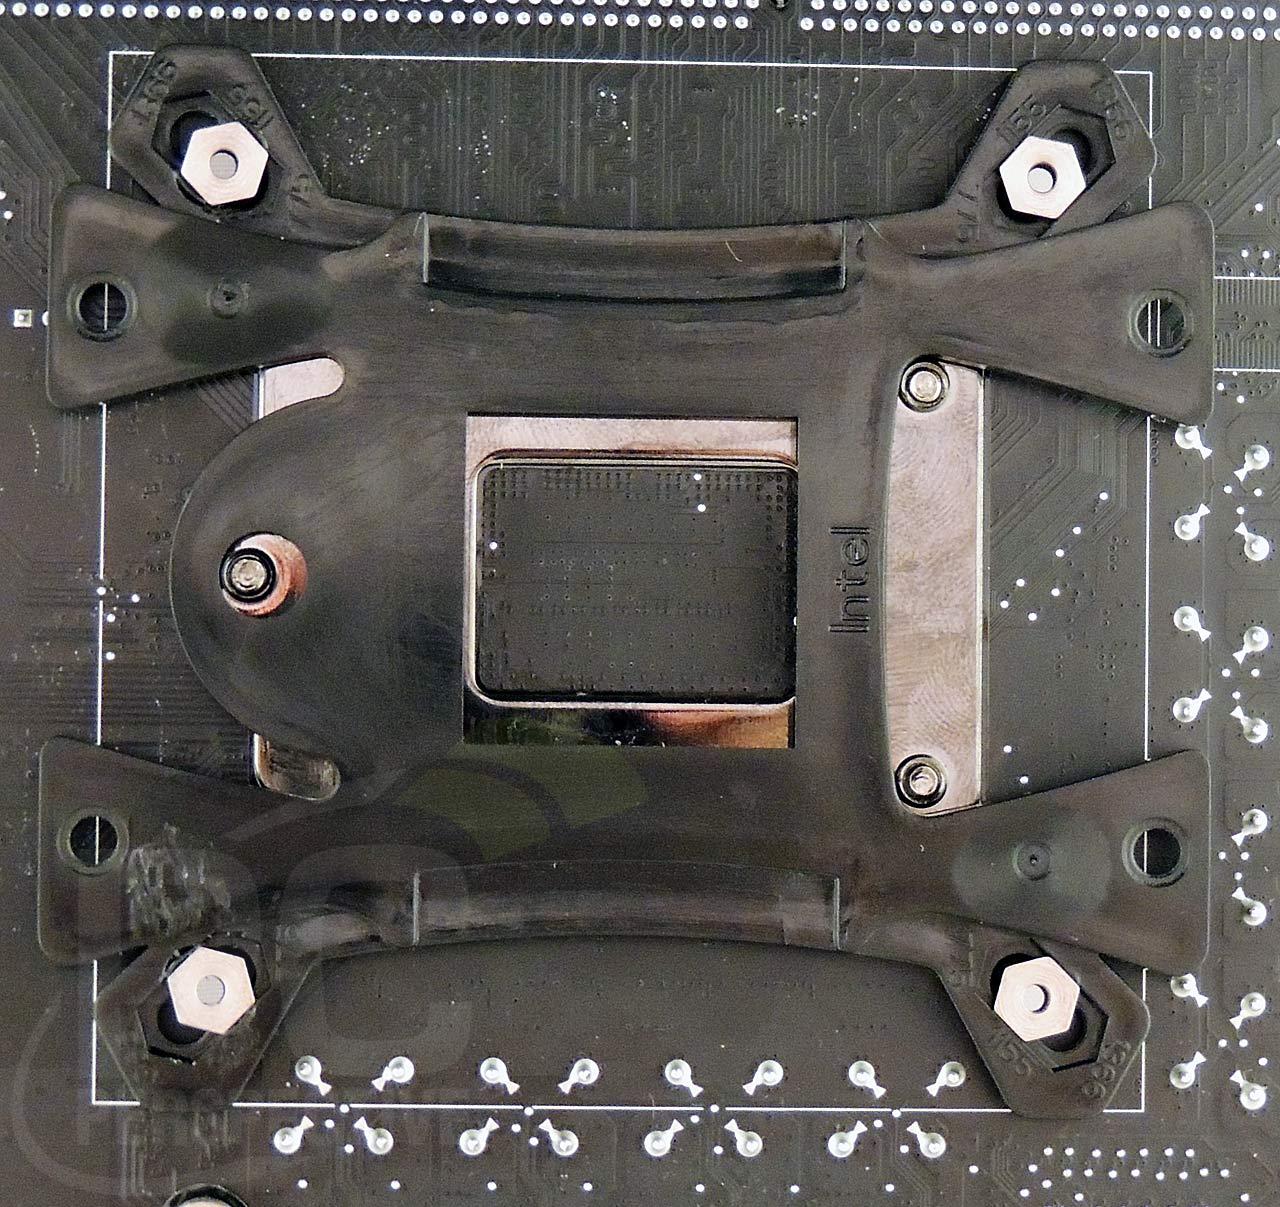 14-antec-board-mount-bottom.jpg